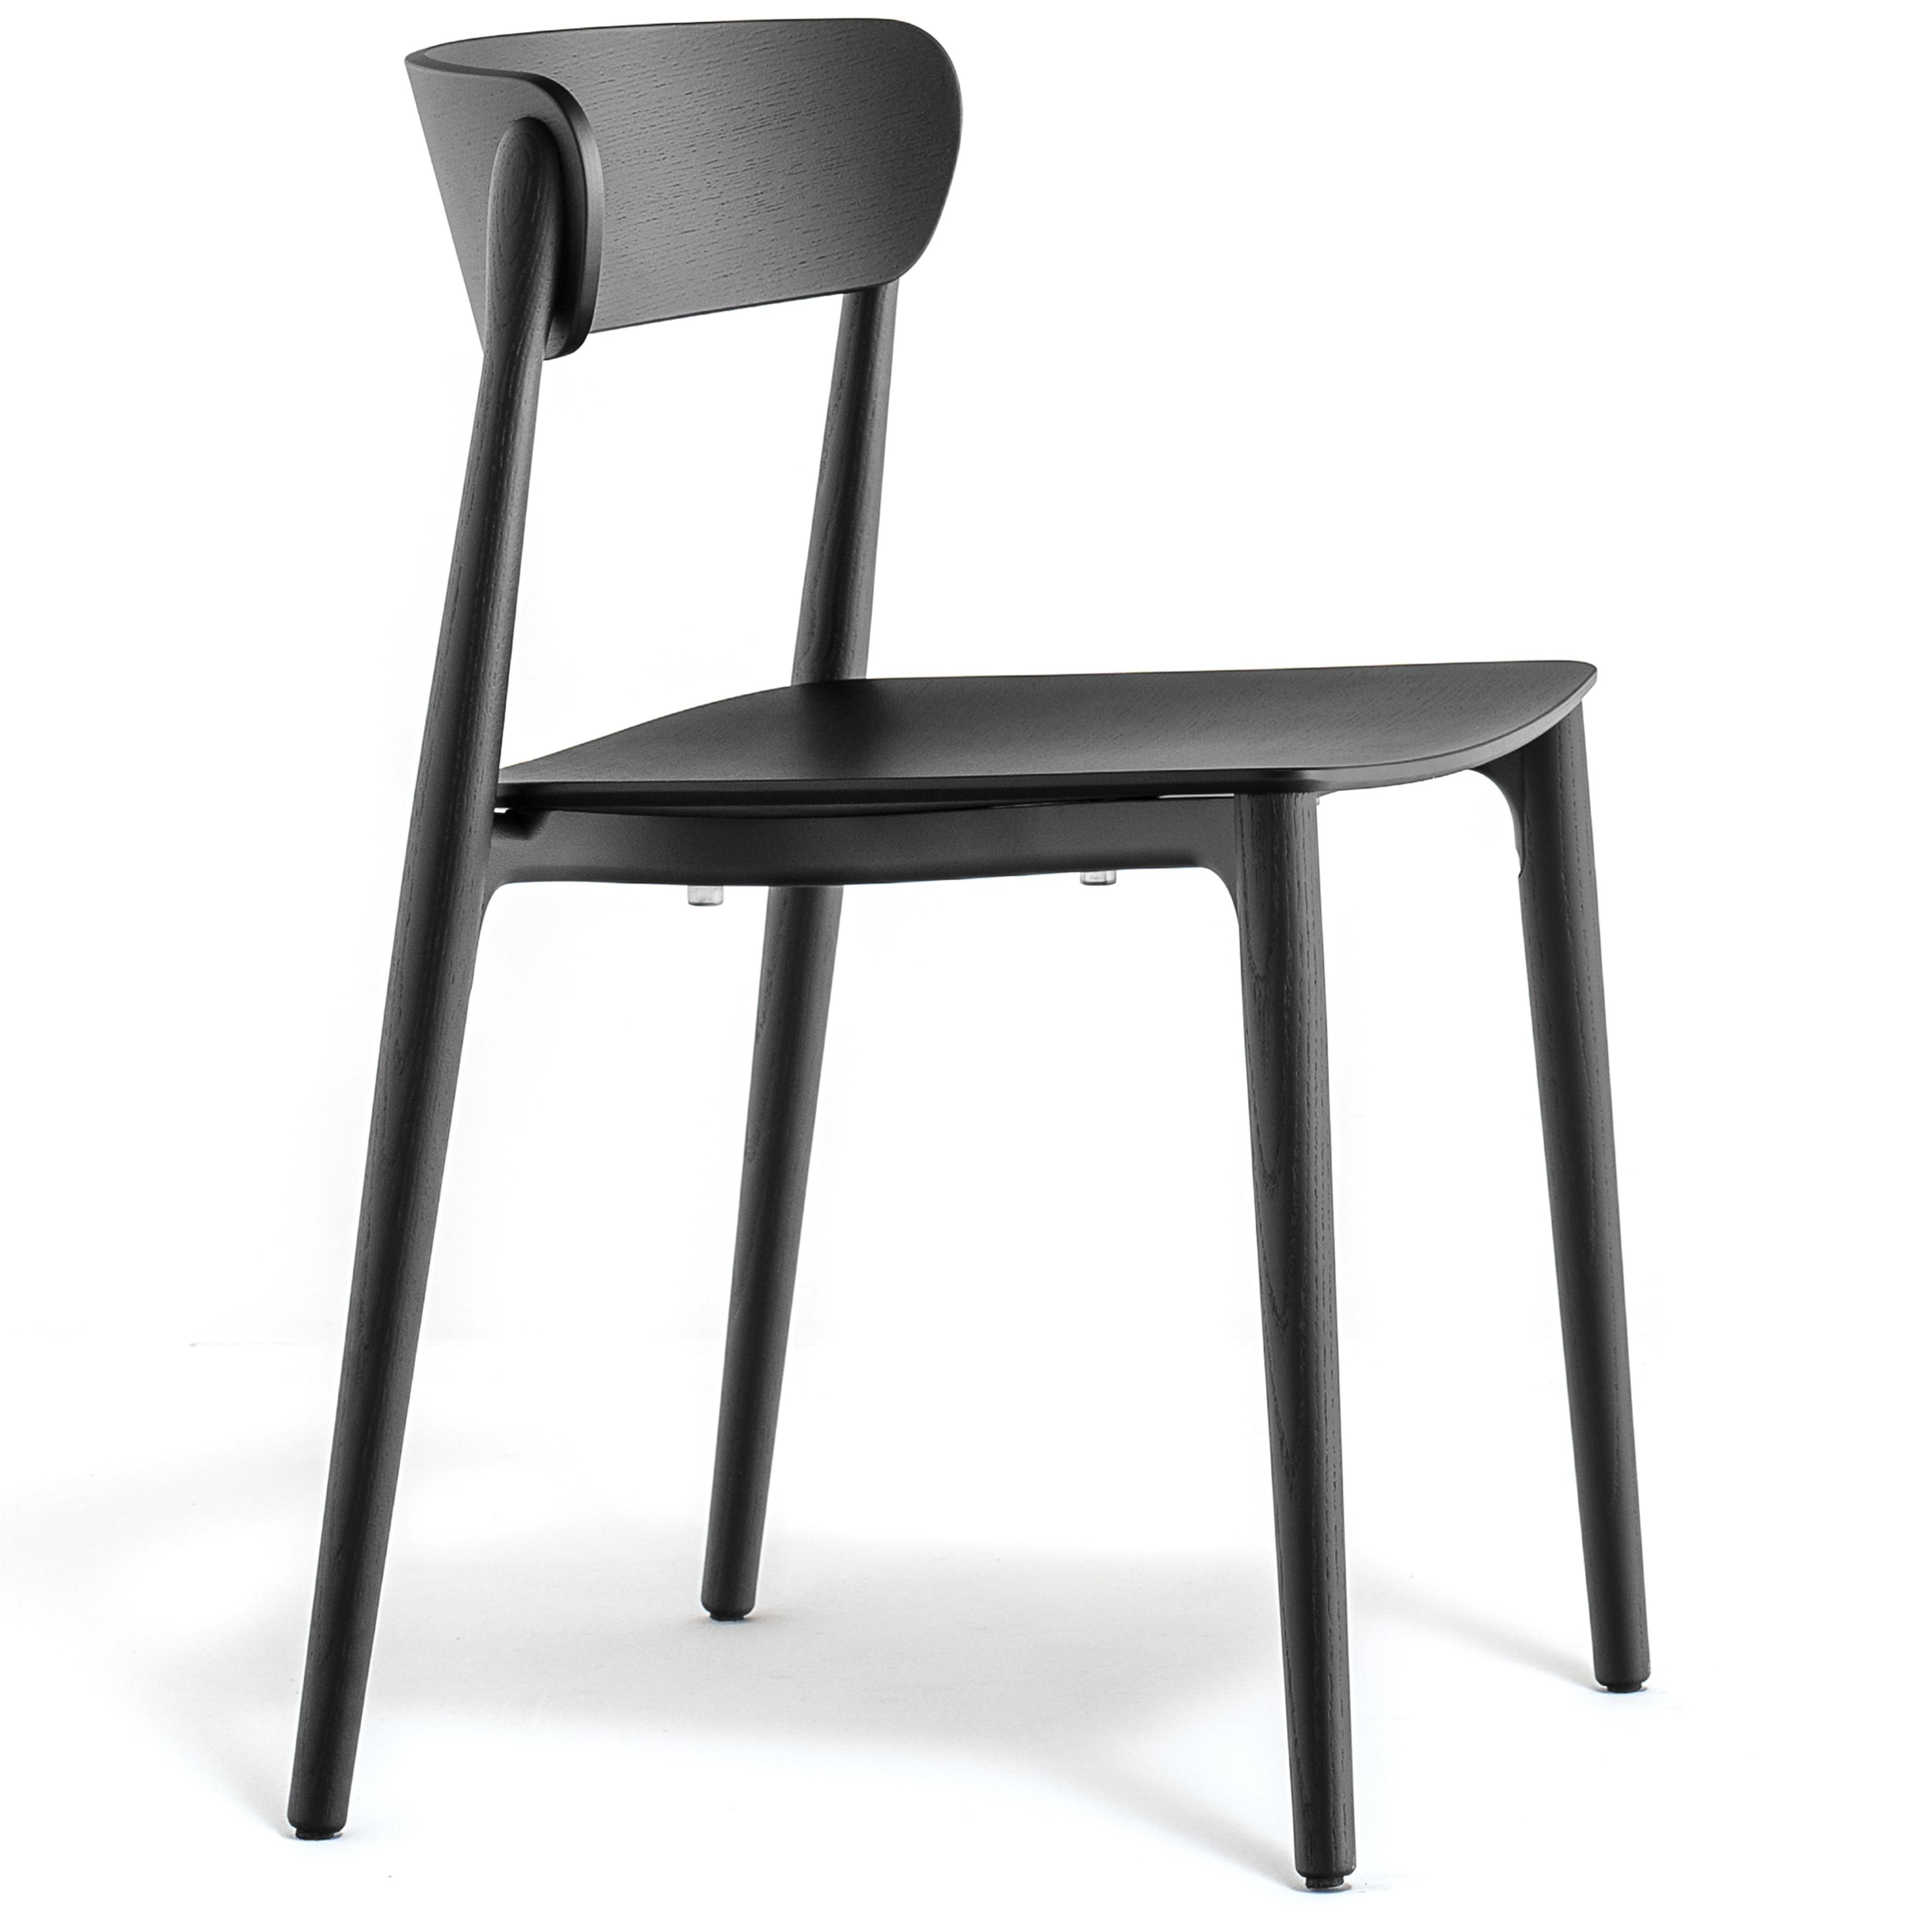 Pedrali sedia Nemea 2820 legno frassino   sedie   Pinterest   Sedie ...